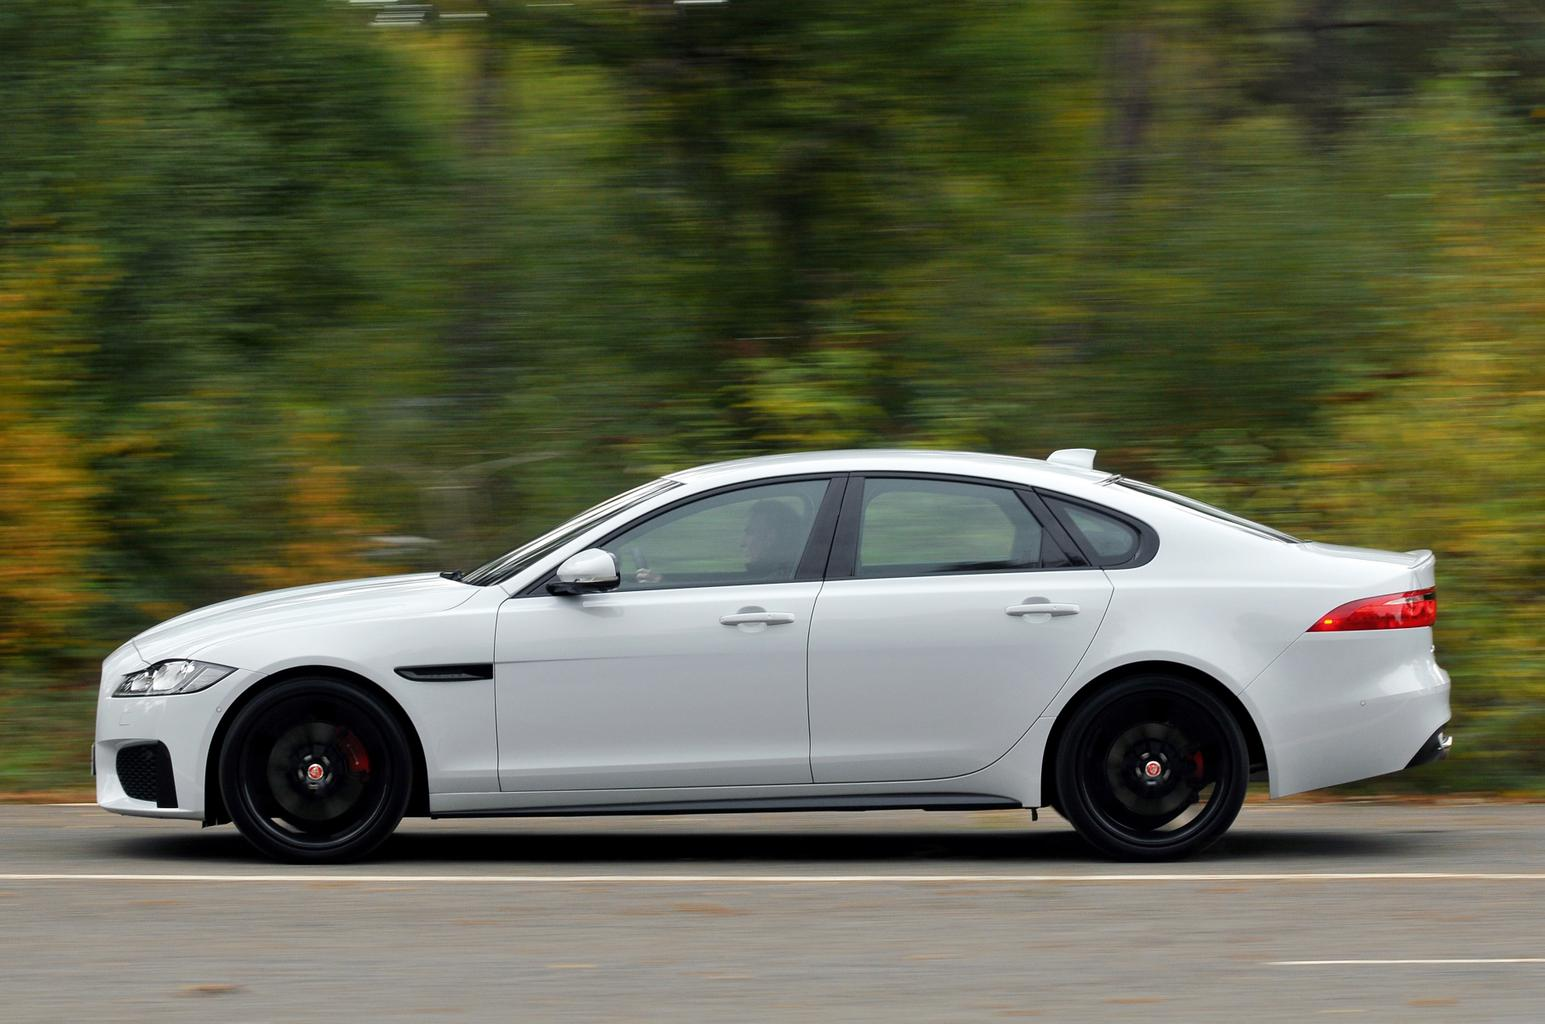 New Jaguar XF vs Audi A7 Sportback vs BMW 5 Series